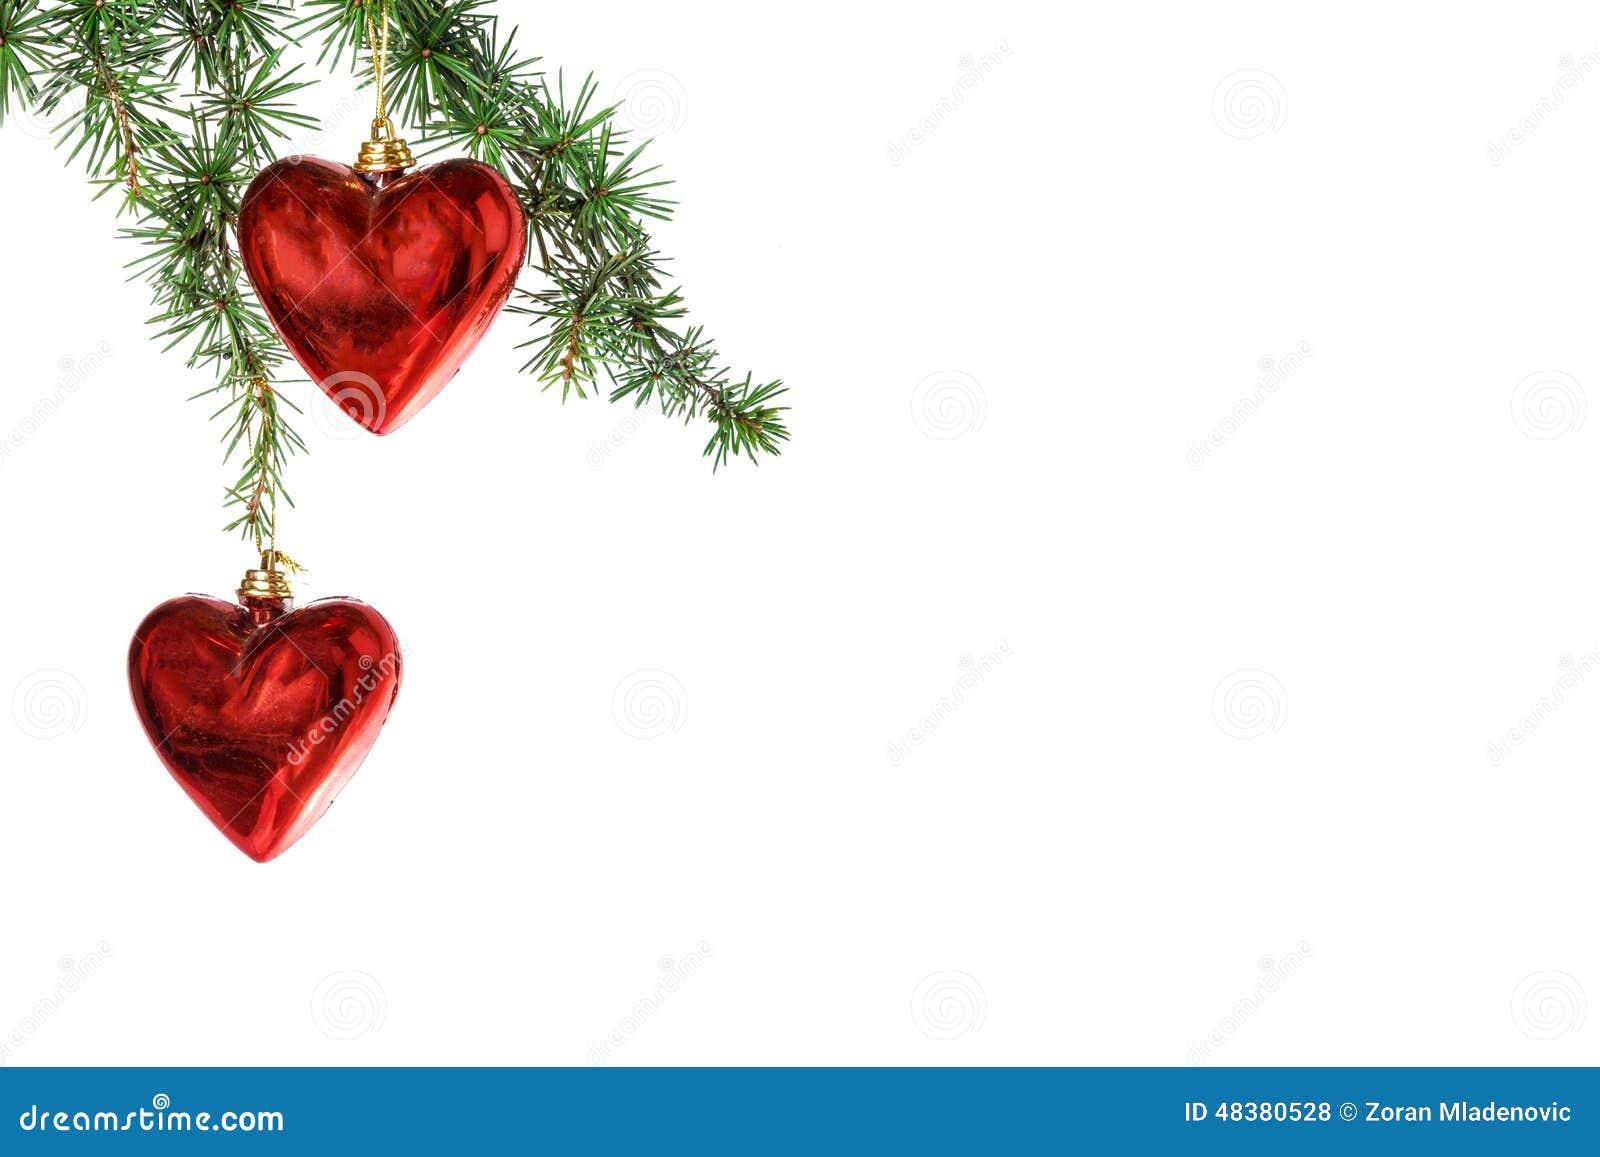 Christmas Heart Decoration.Red Heart Christmas Ornaments Stock Photo 48380528 Megapixl